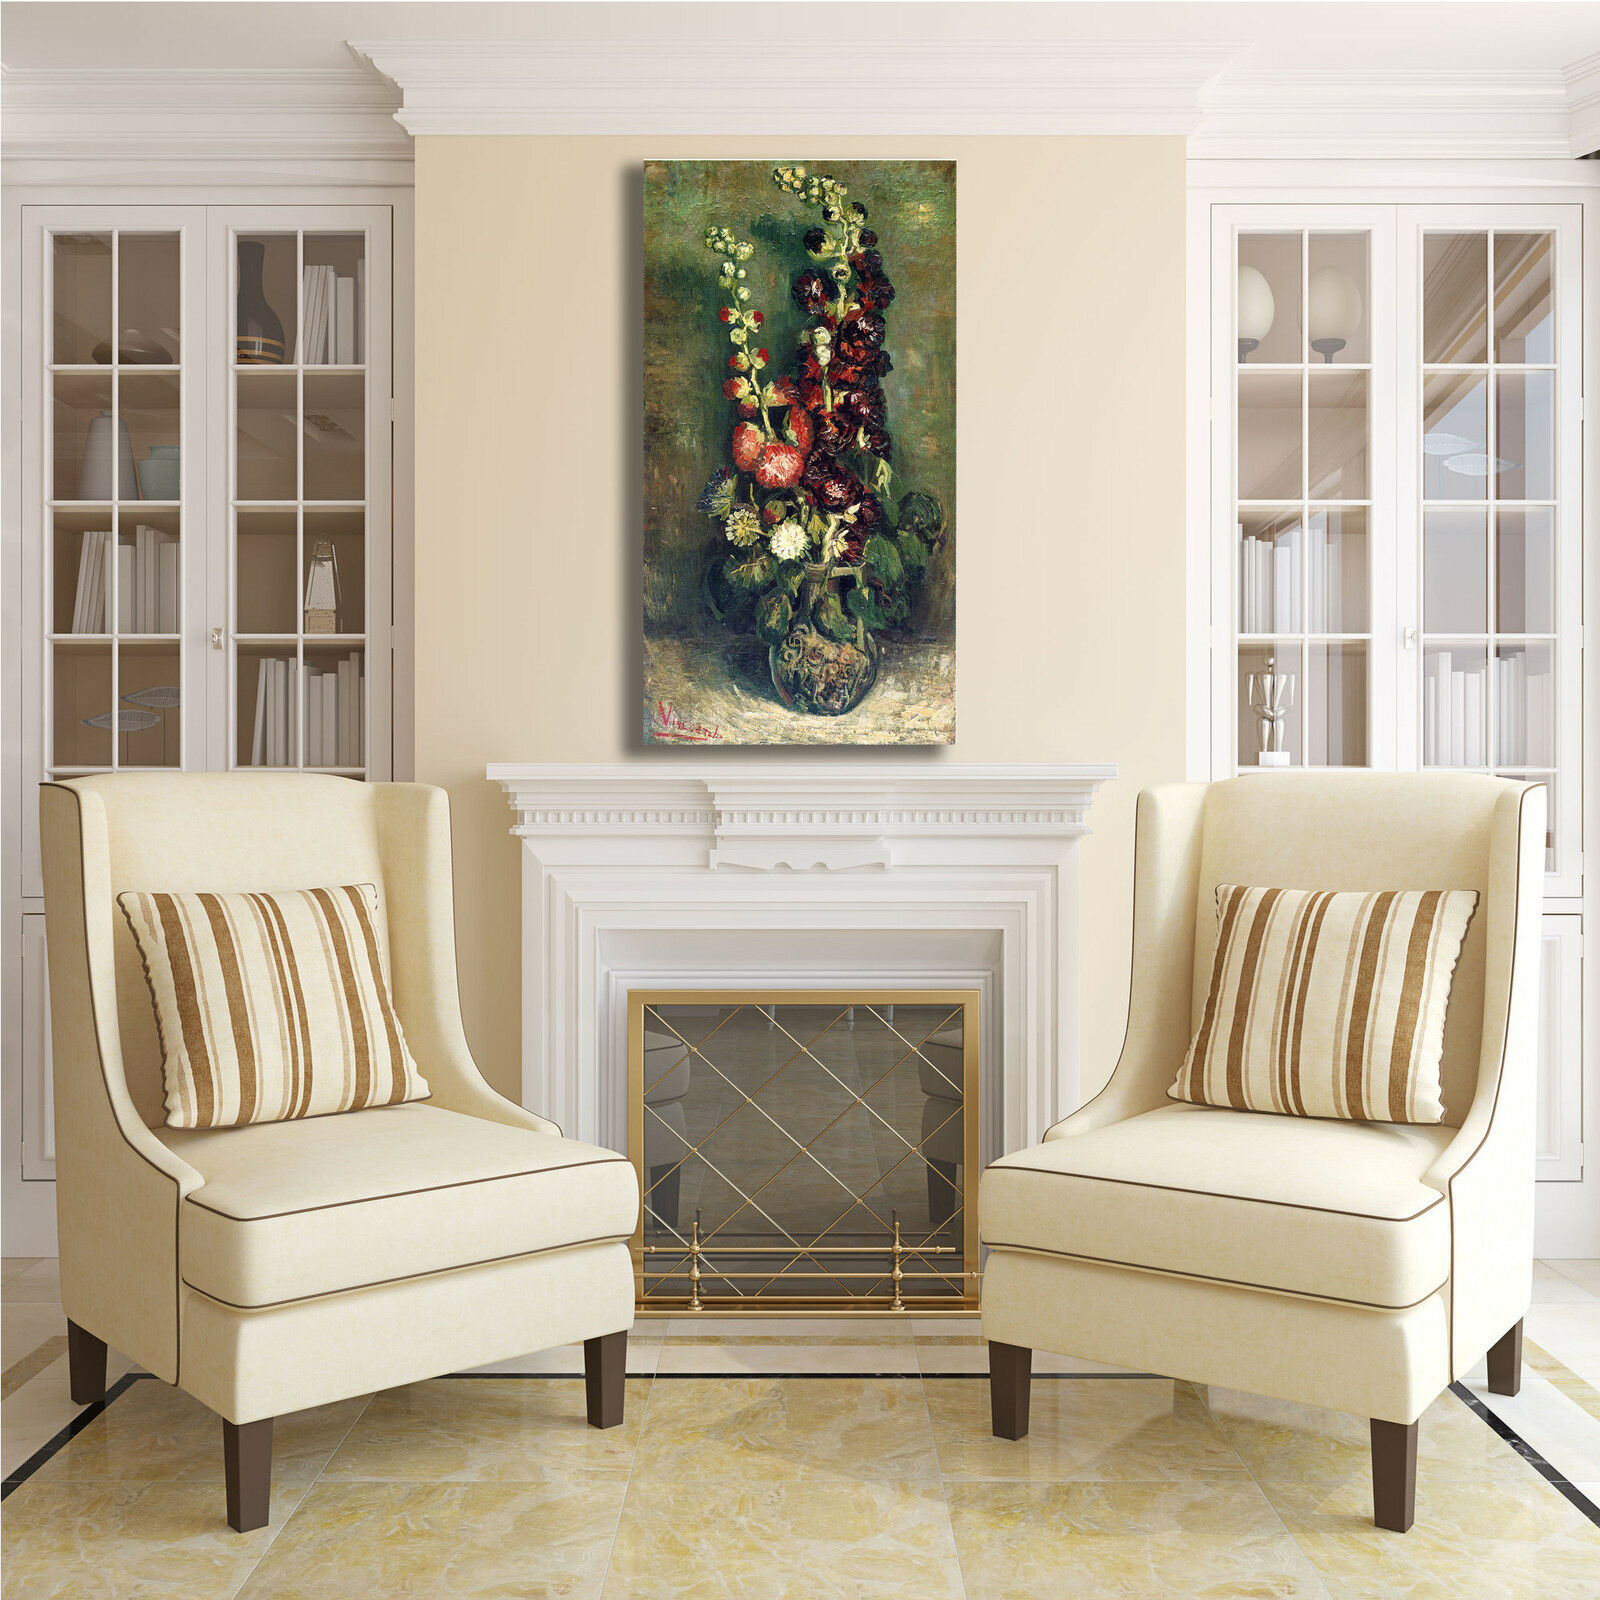 Van Gogh Gogh Van vaso di altee design quadro stampa tela dipinto telaio arRouge o casa 8aaf6d